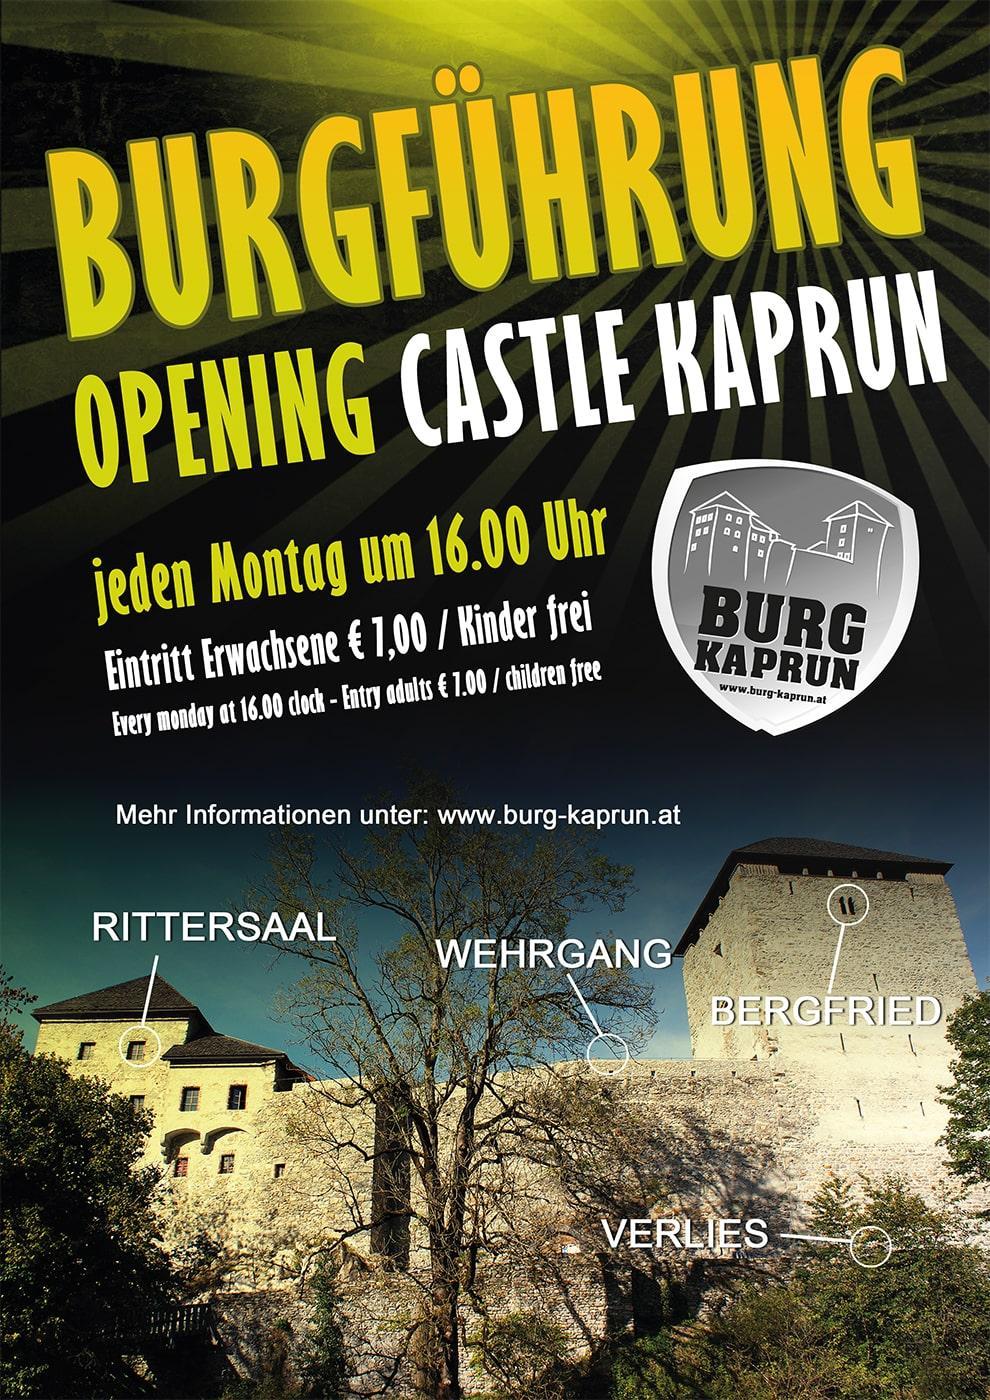 Burg Kaprun - Burgführung